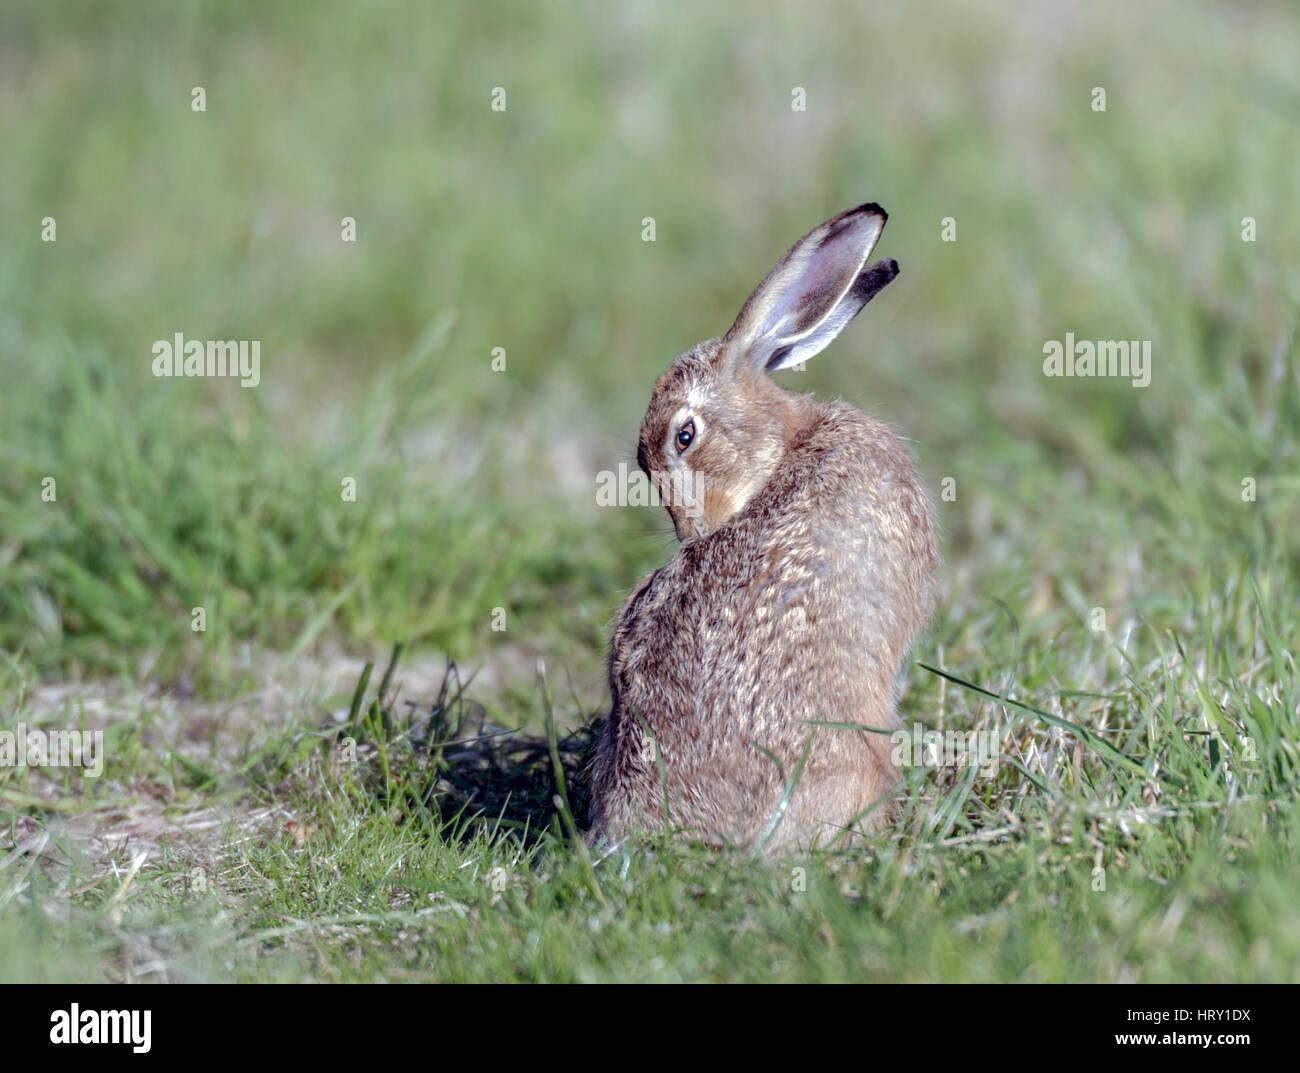 Brown Hare(Lepus europaeus) grooming itself on North Norfolk farmland. - Stock Image